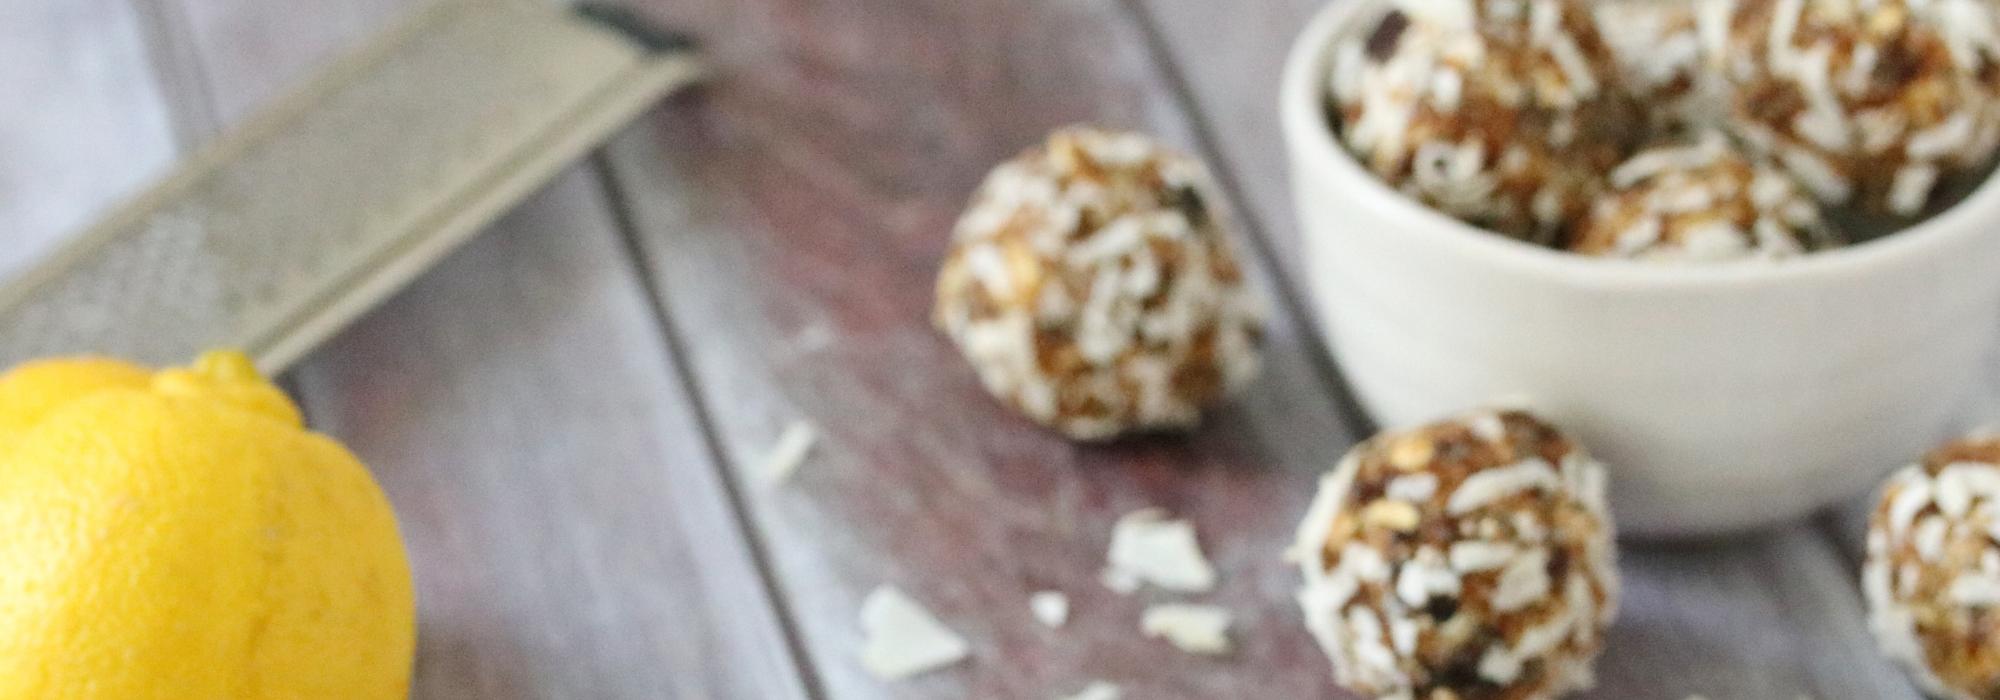 Lemon Coconut Energy Balls Recipe